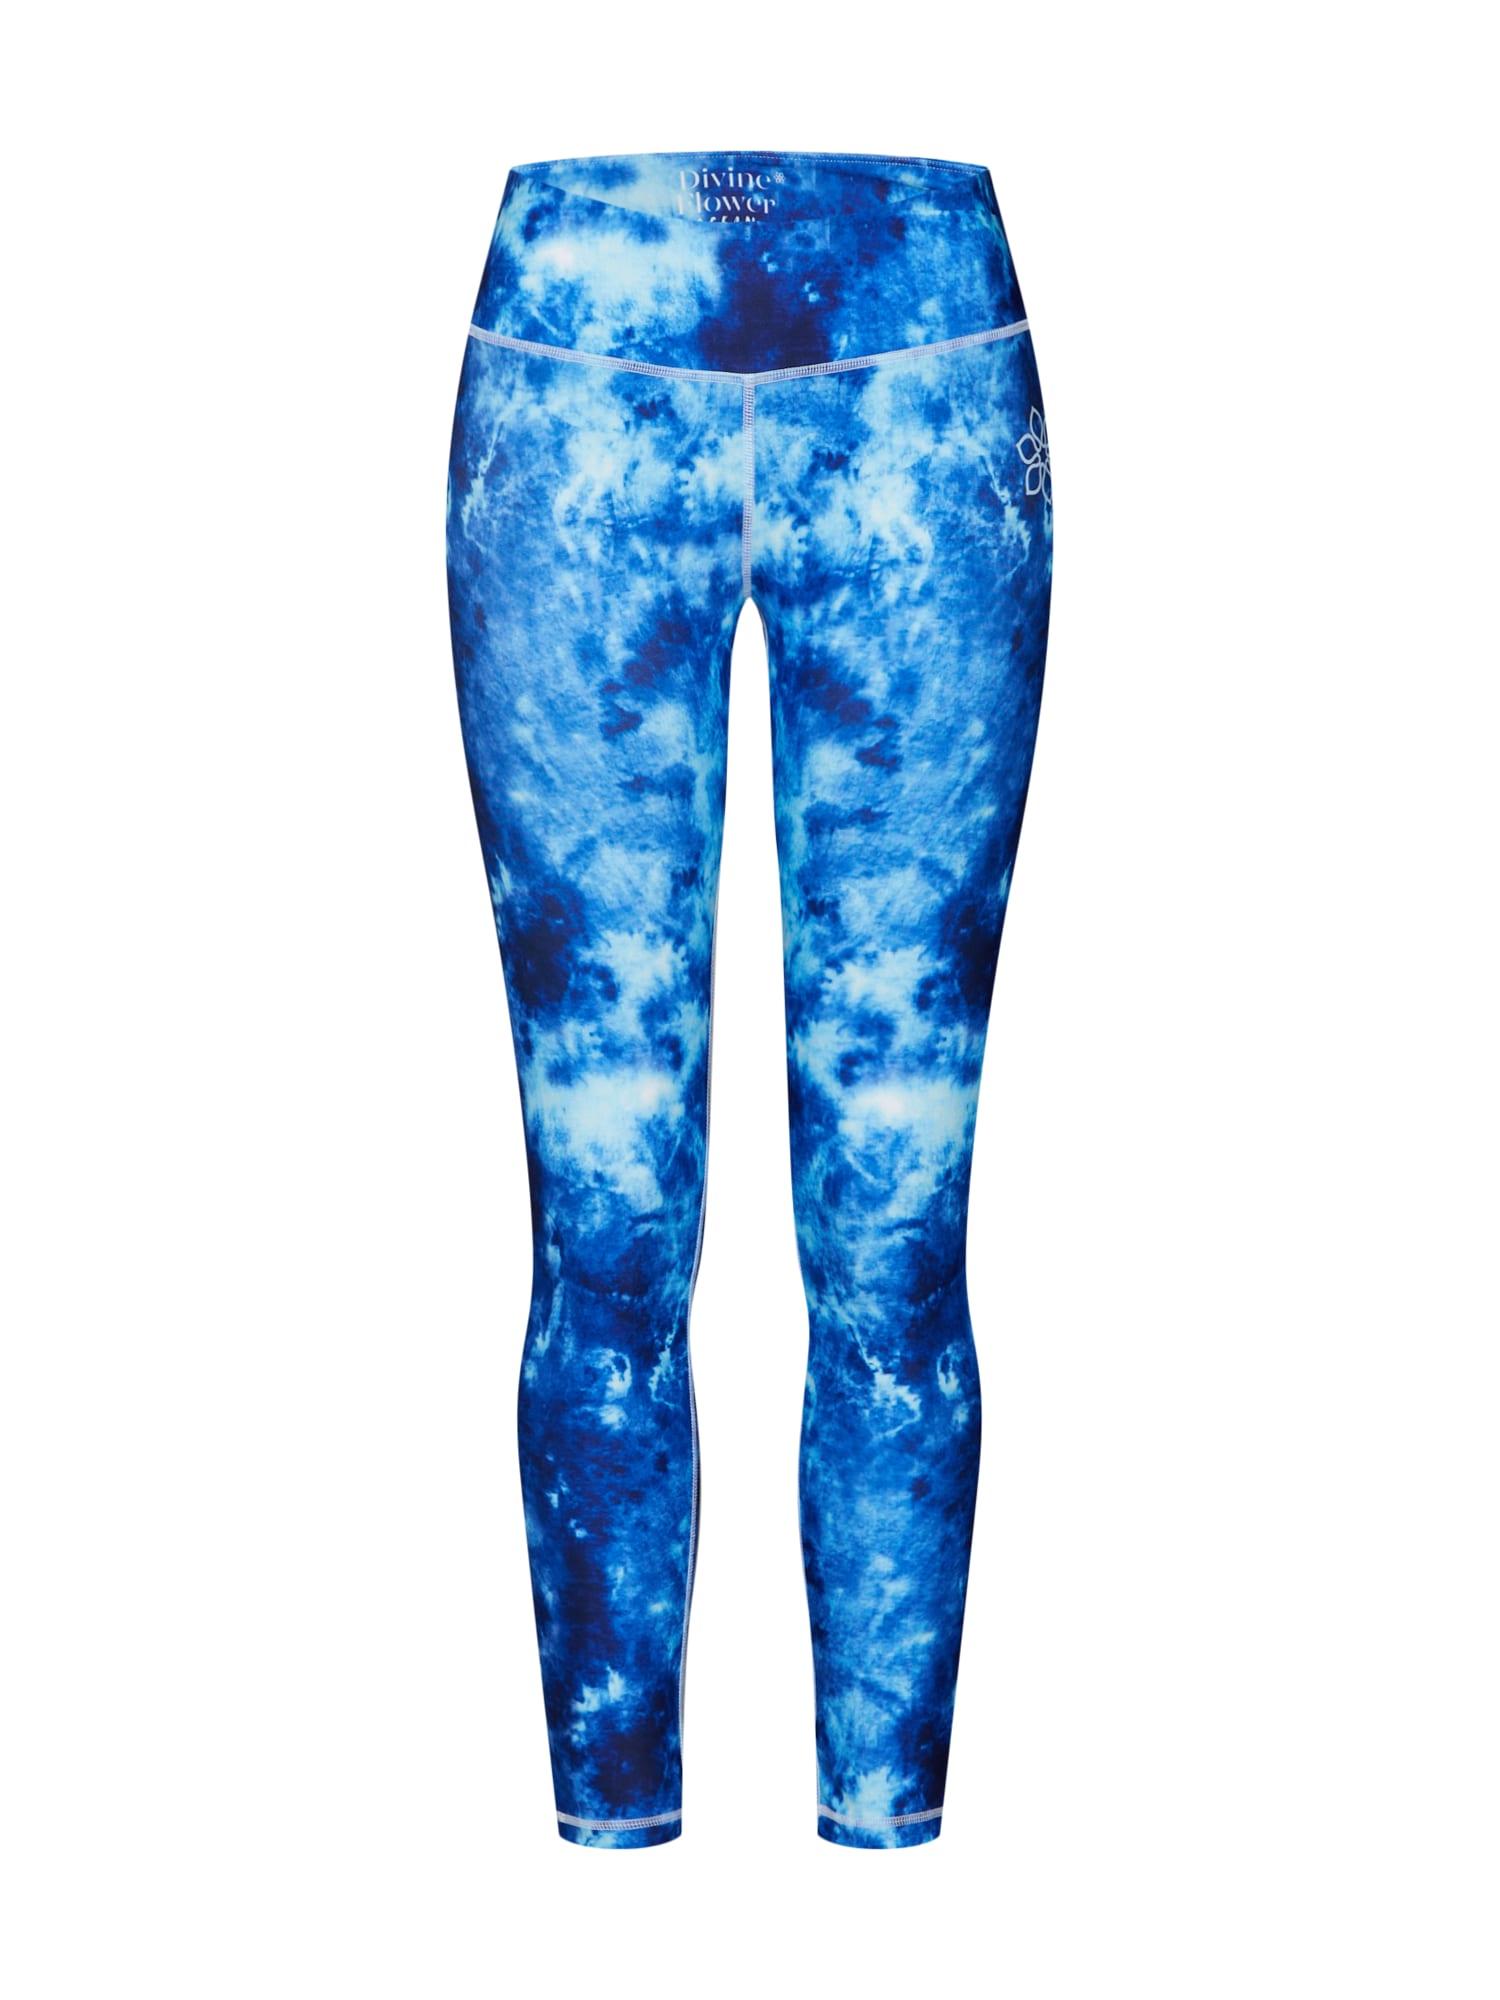 Divine Flower Sportinės kelnės 'Lilaia' mėlyna